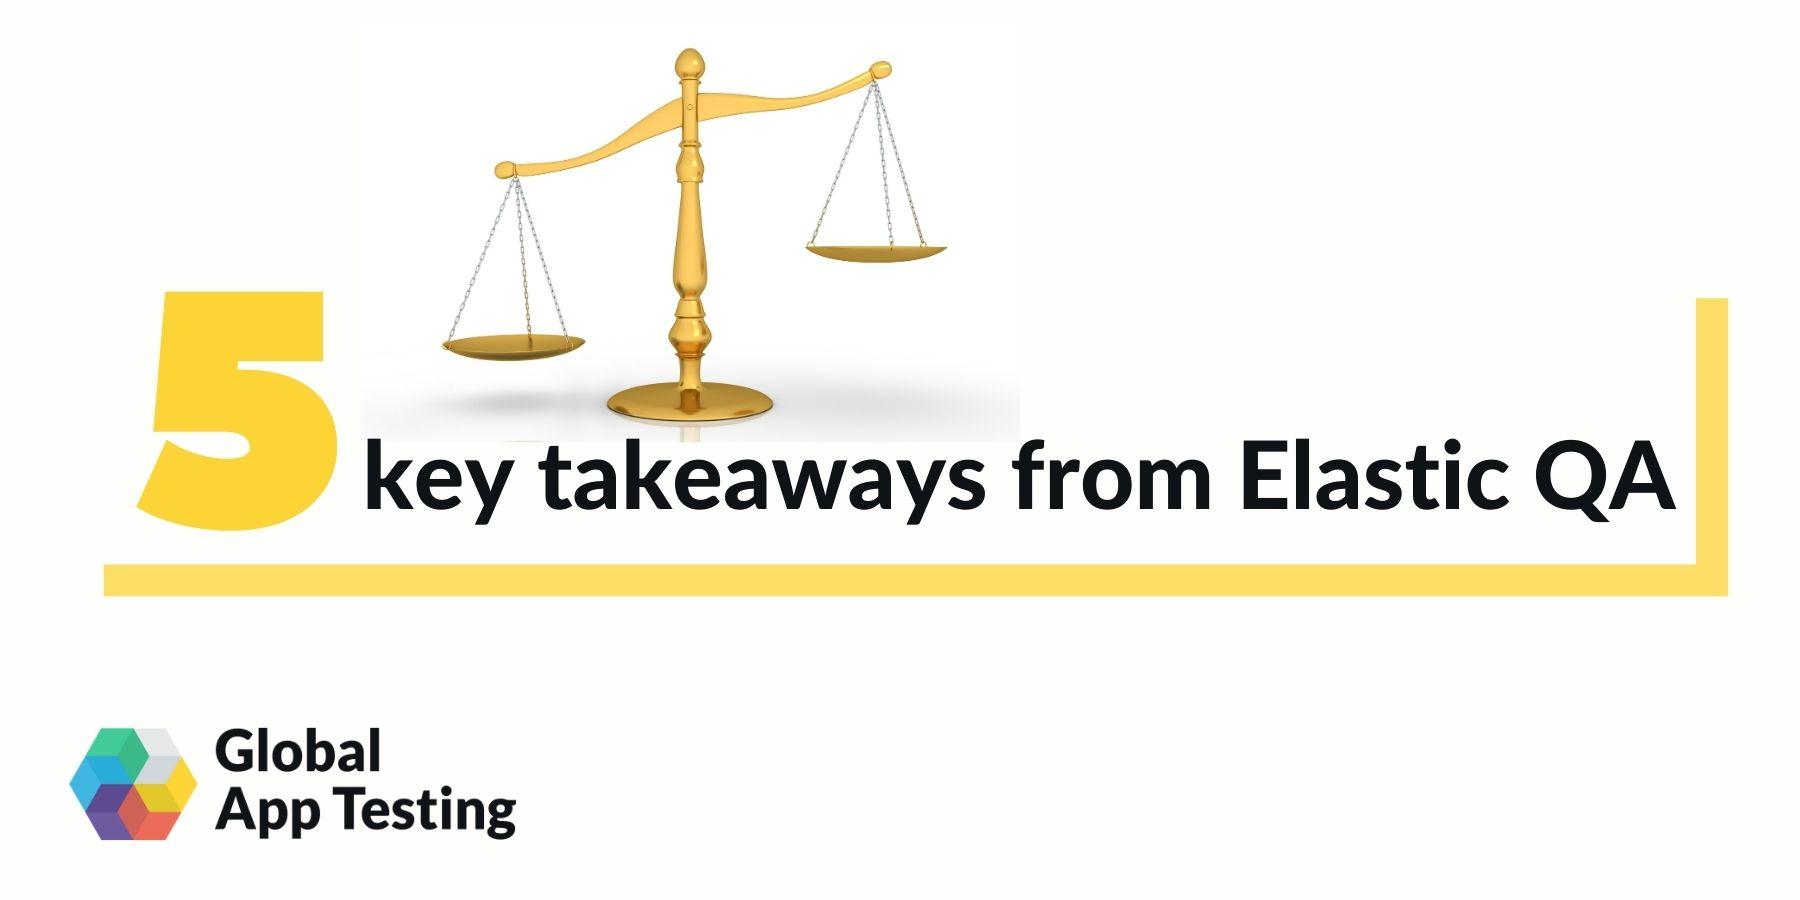 5 key takeaways from Elastic QA